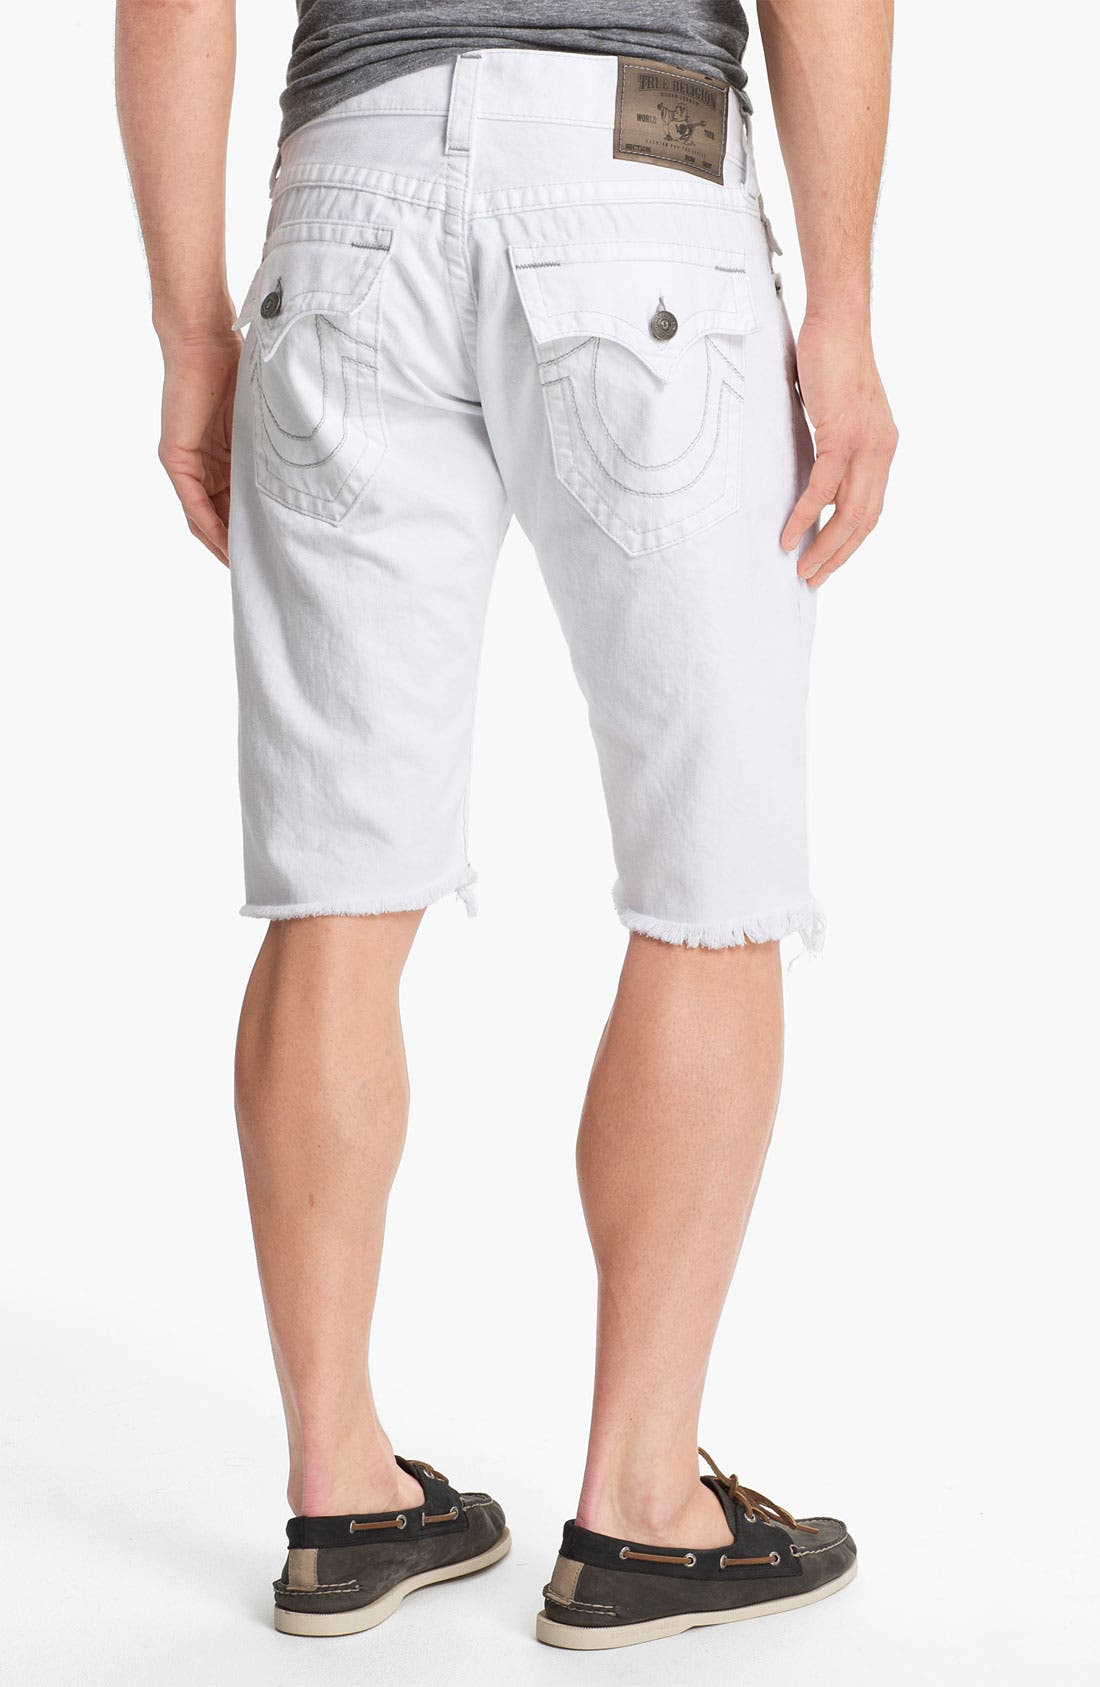 Alternate Image 1 Selected - True Religion Brand Jeans 'Ricky' Cutoff Denim Shorts